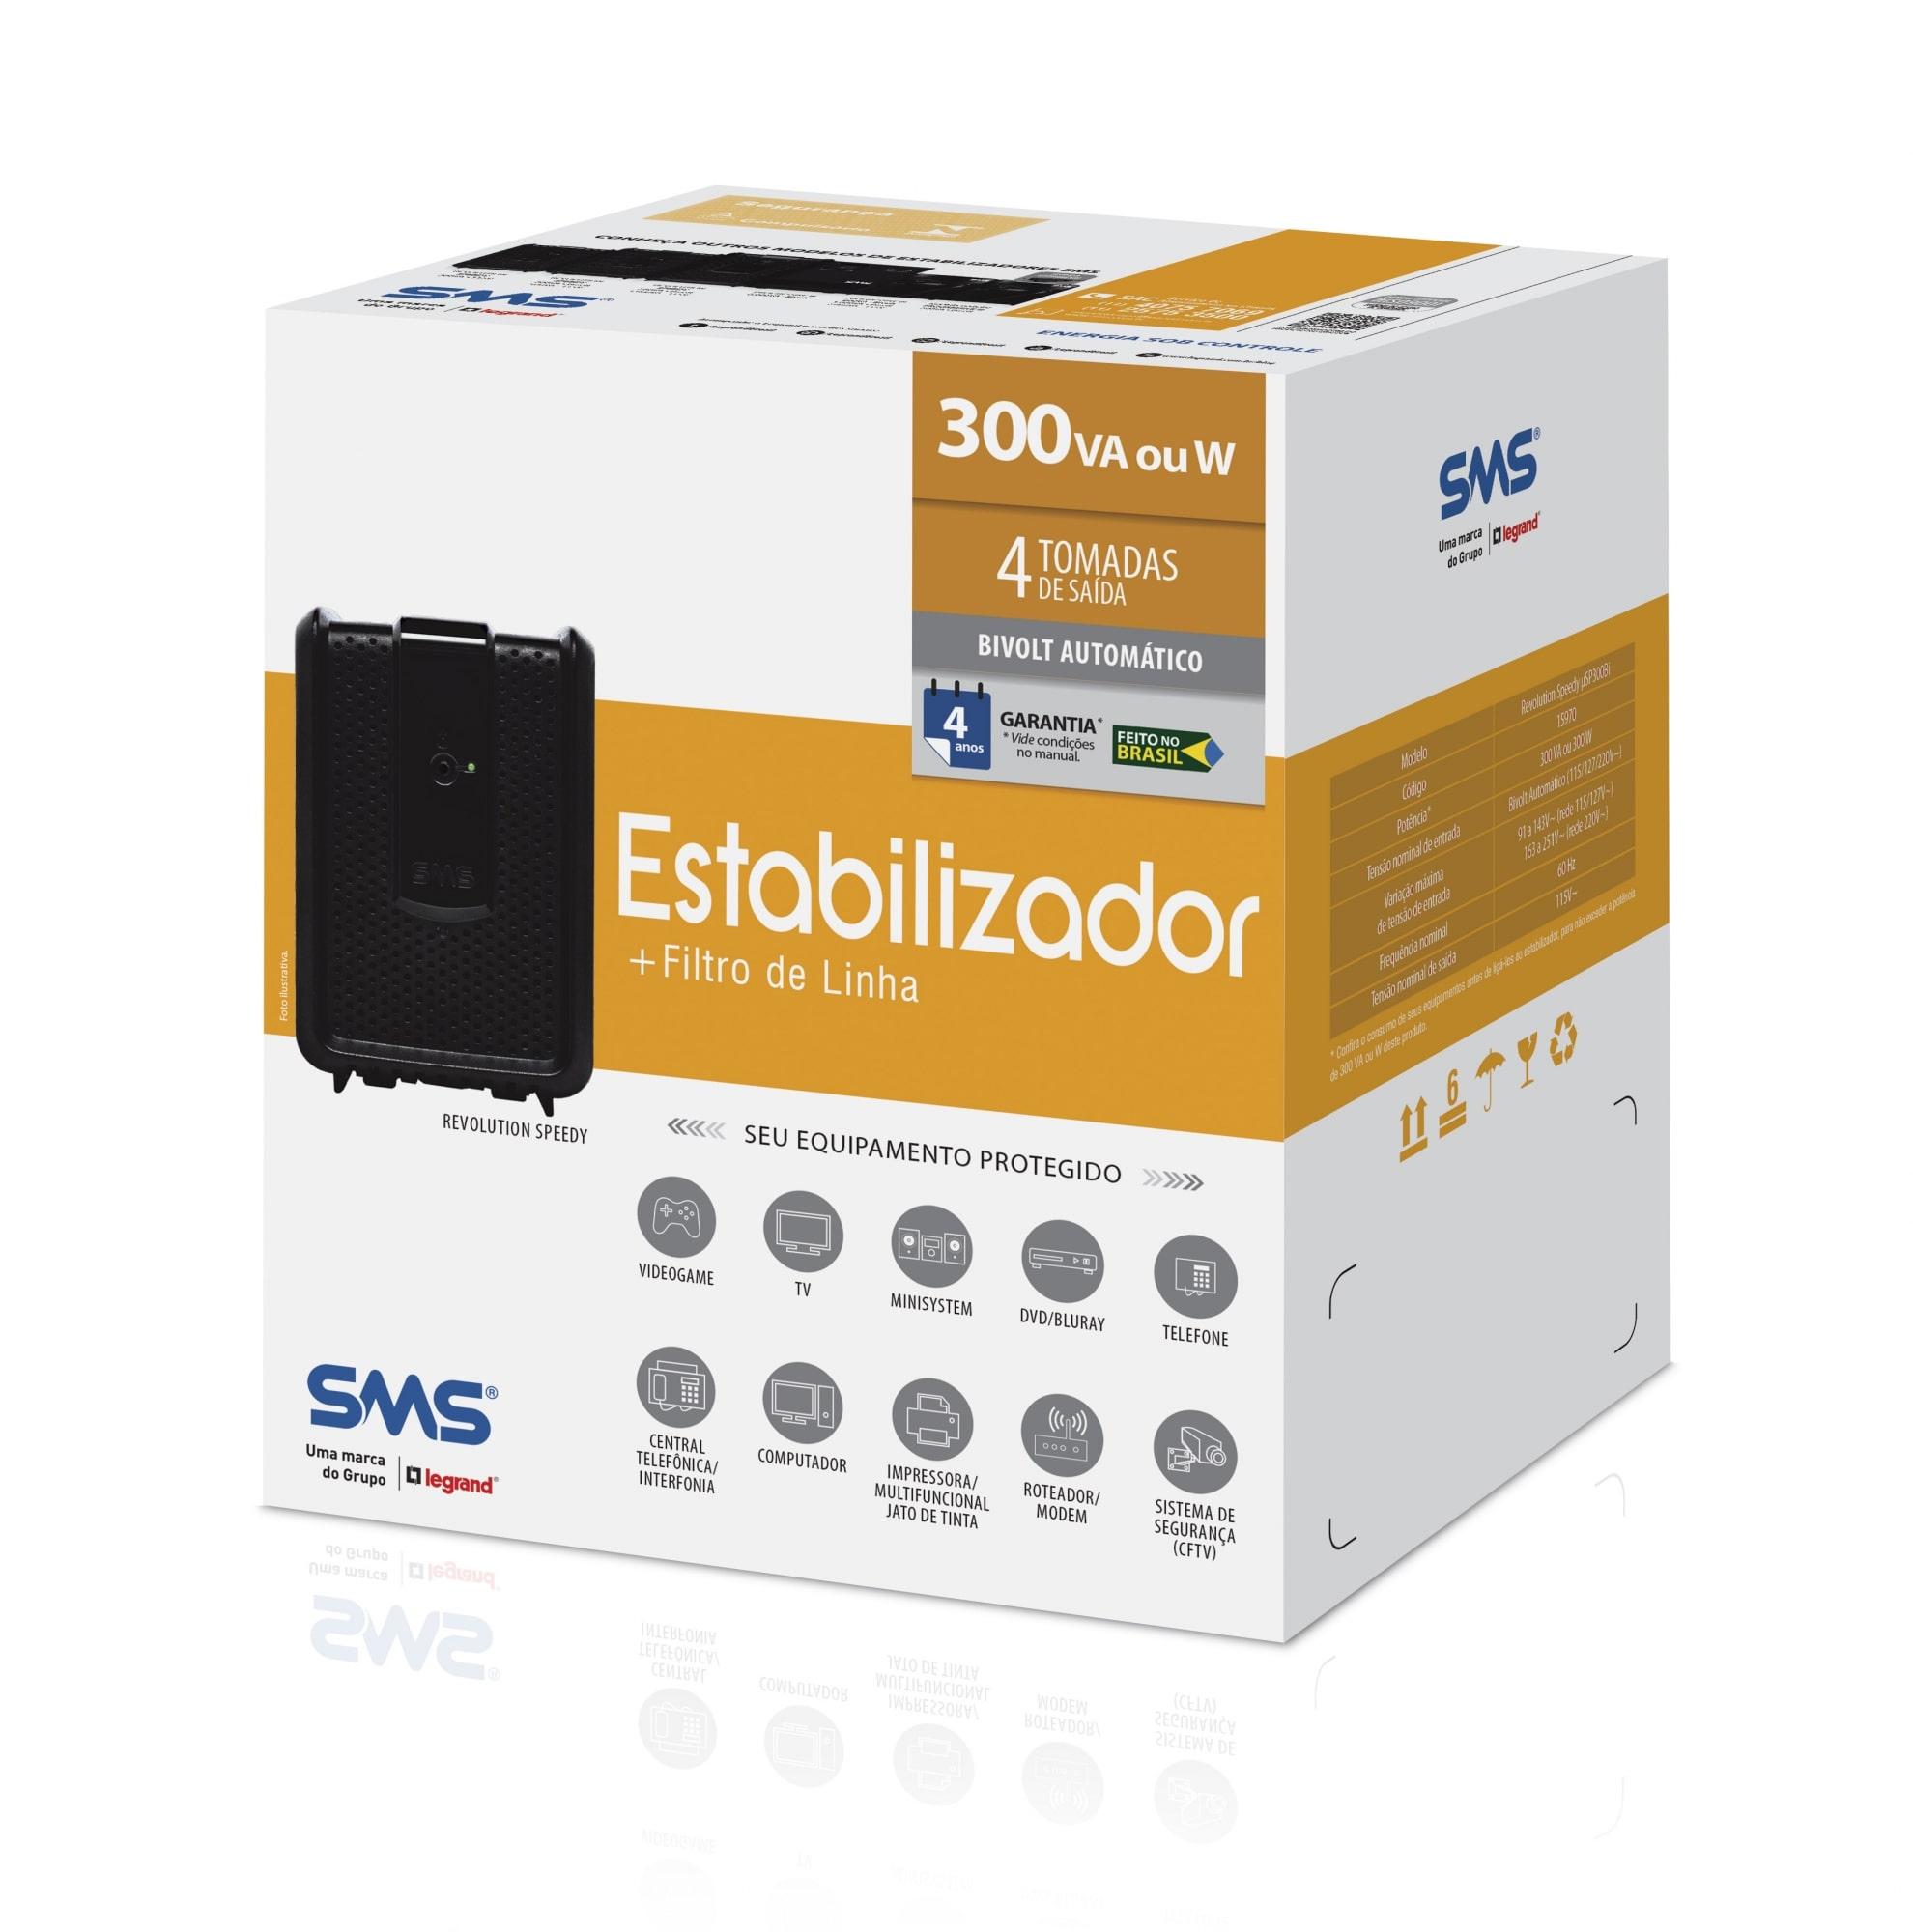 Estabilizador SMS Revolution Speedy 300VA Bivolt - uSP300Bi (15970)